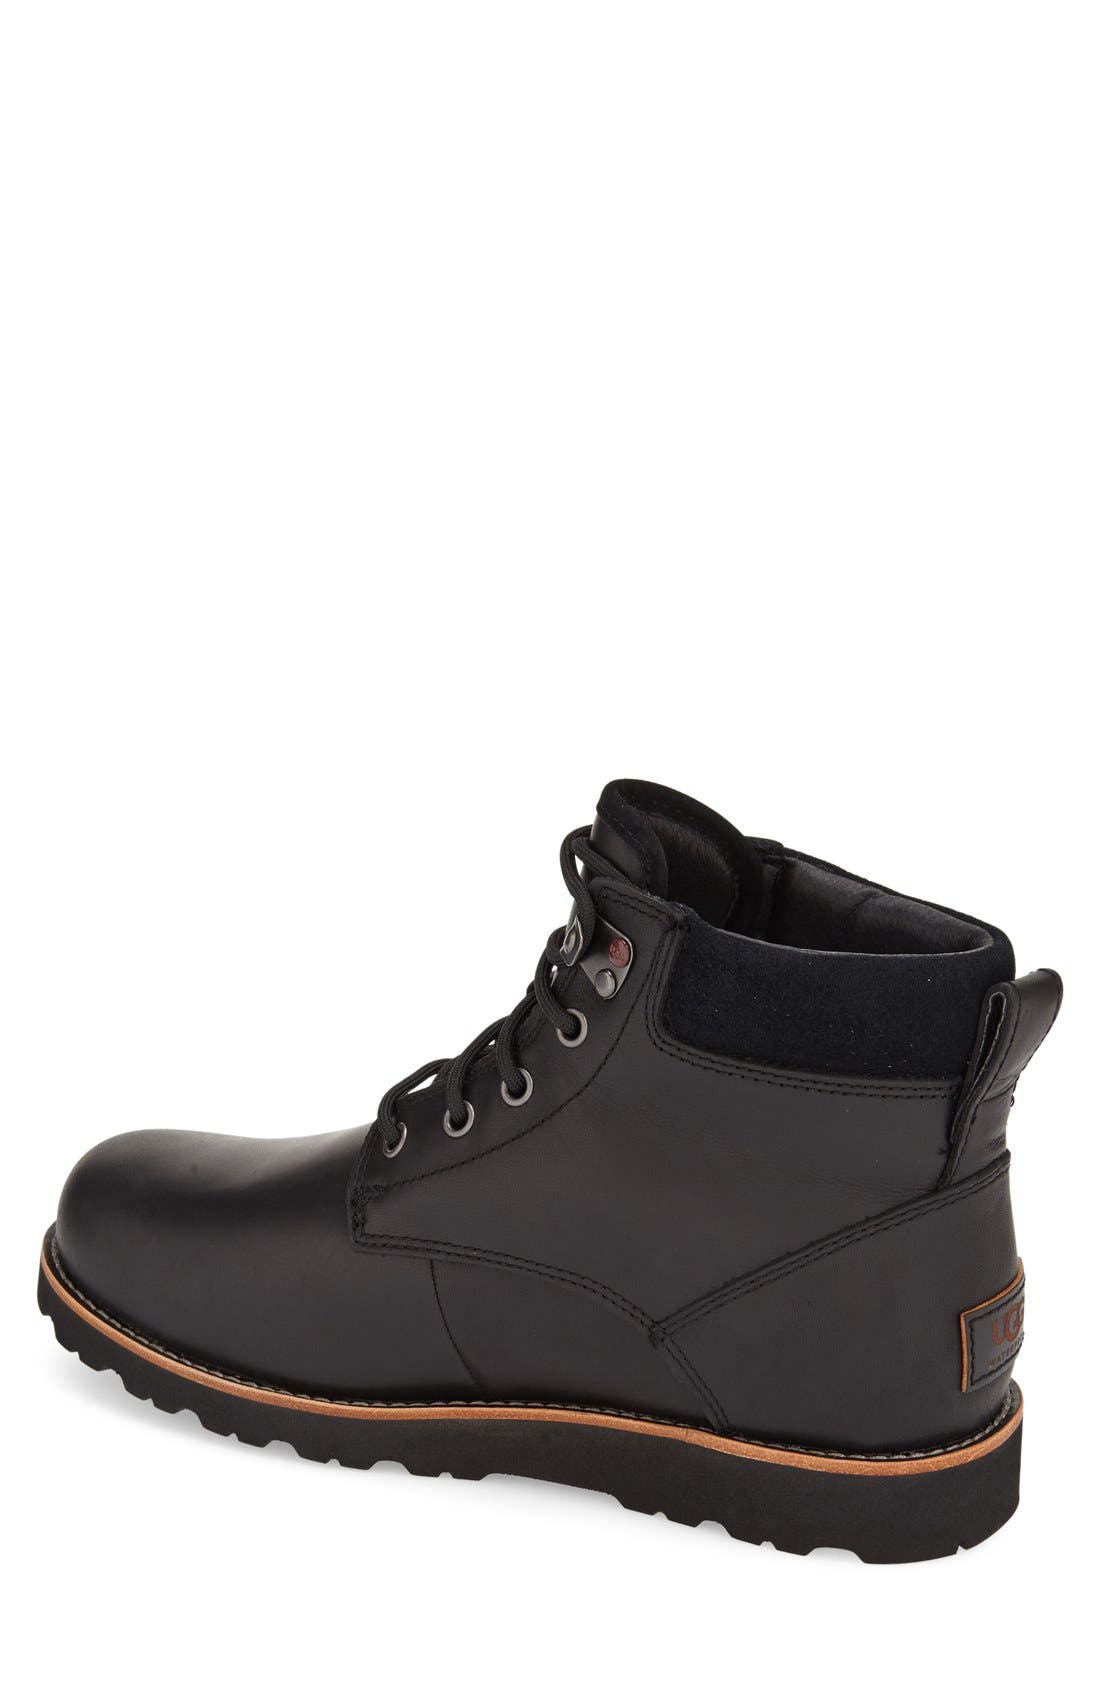 Seton Waterproof Chukka Boot,                             Alternate thumbnail 2, color,                             BLACK